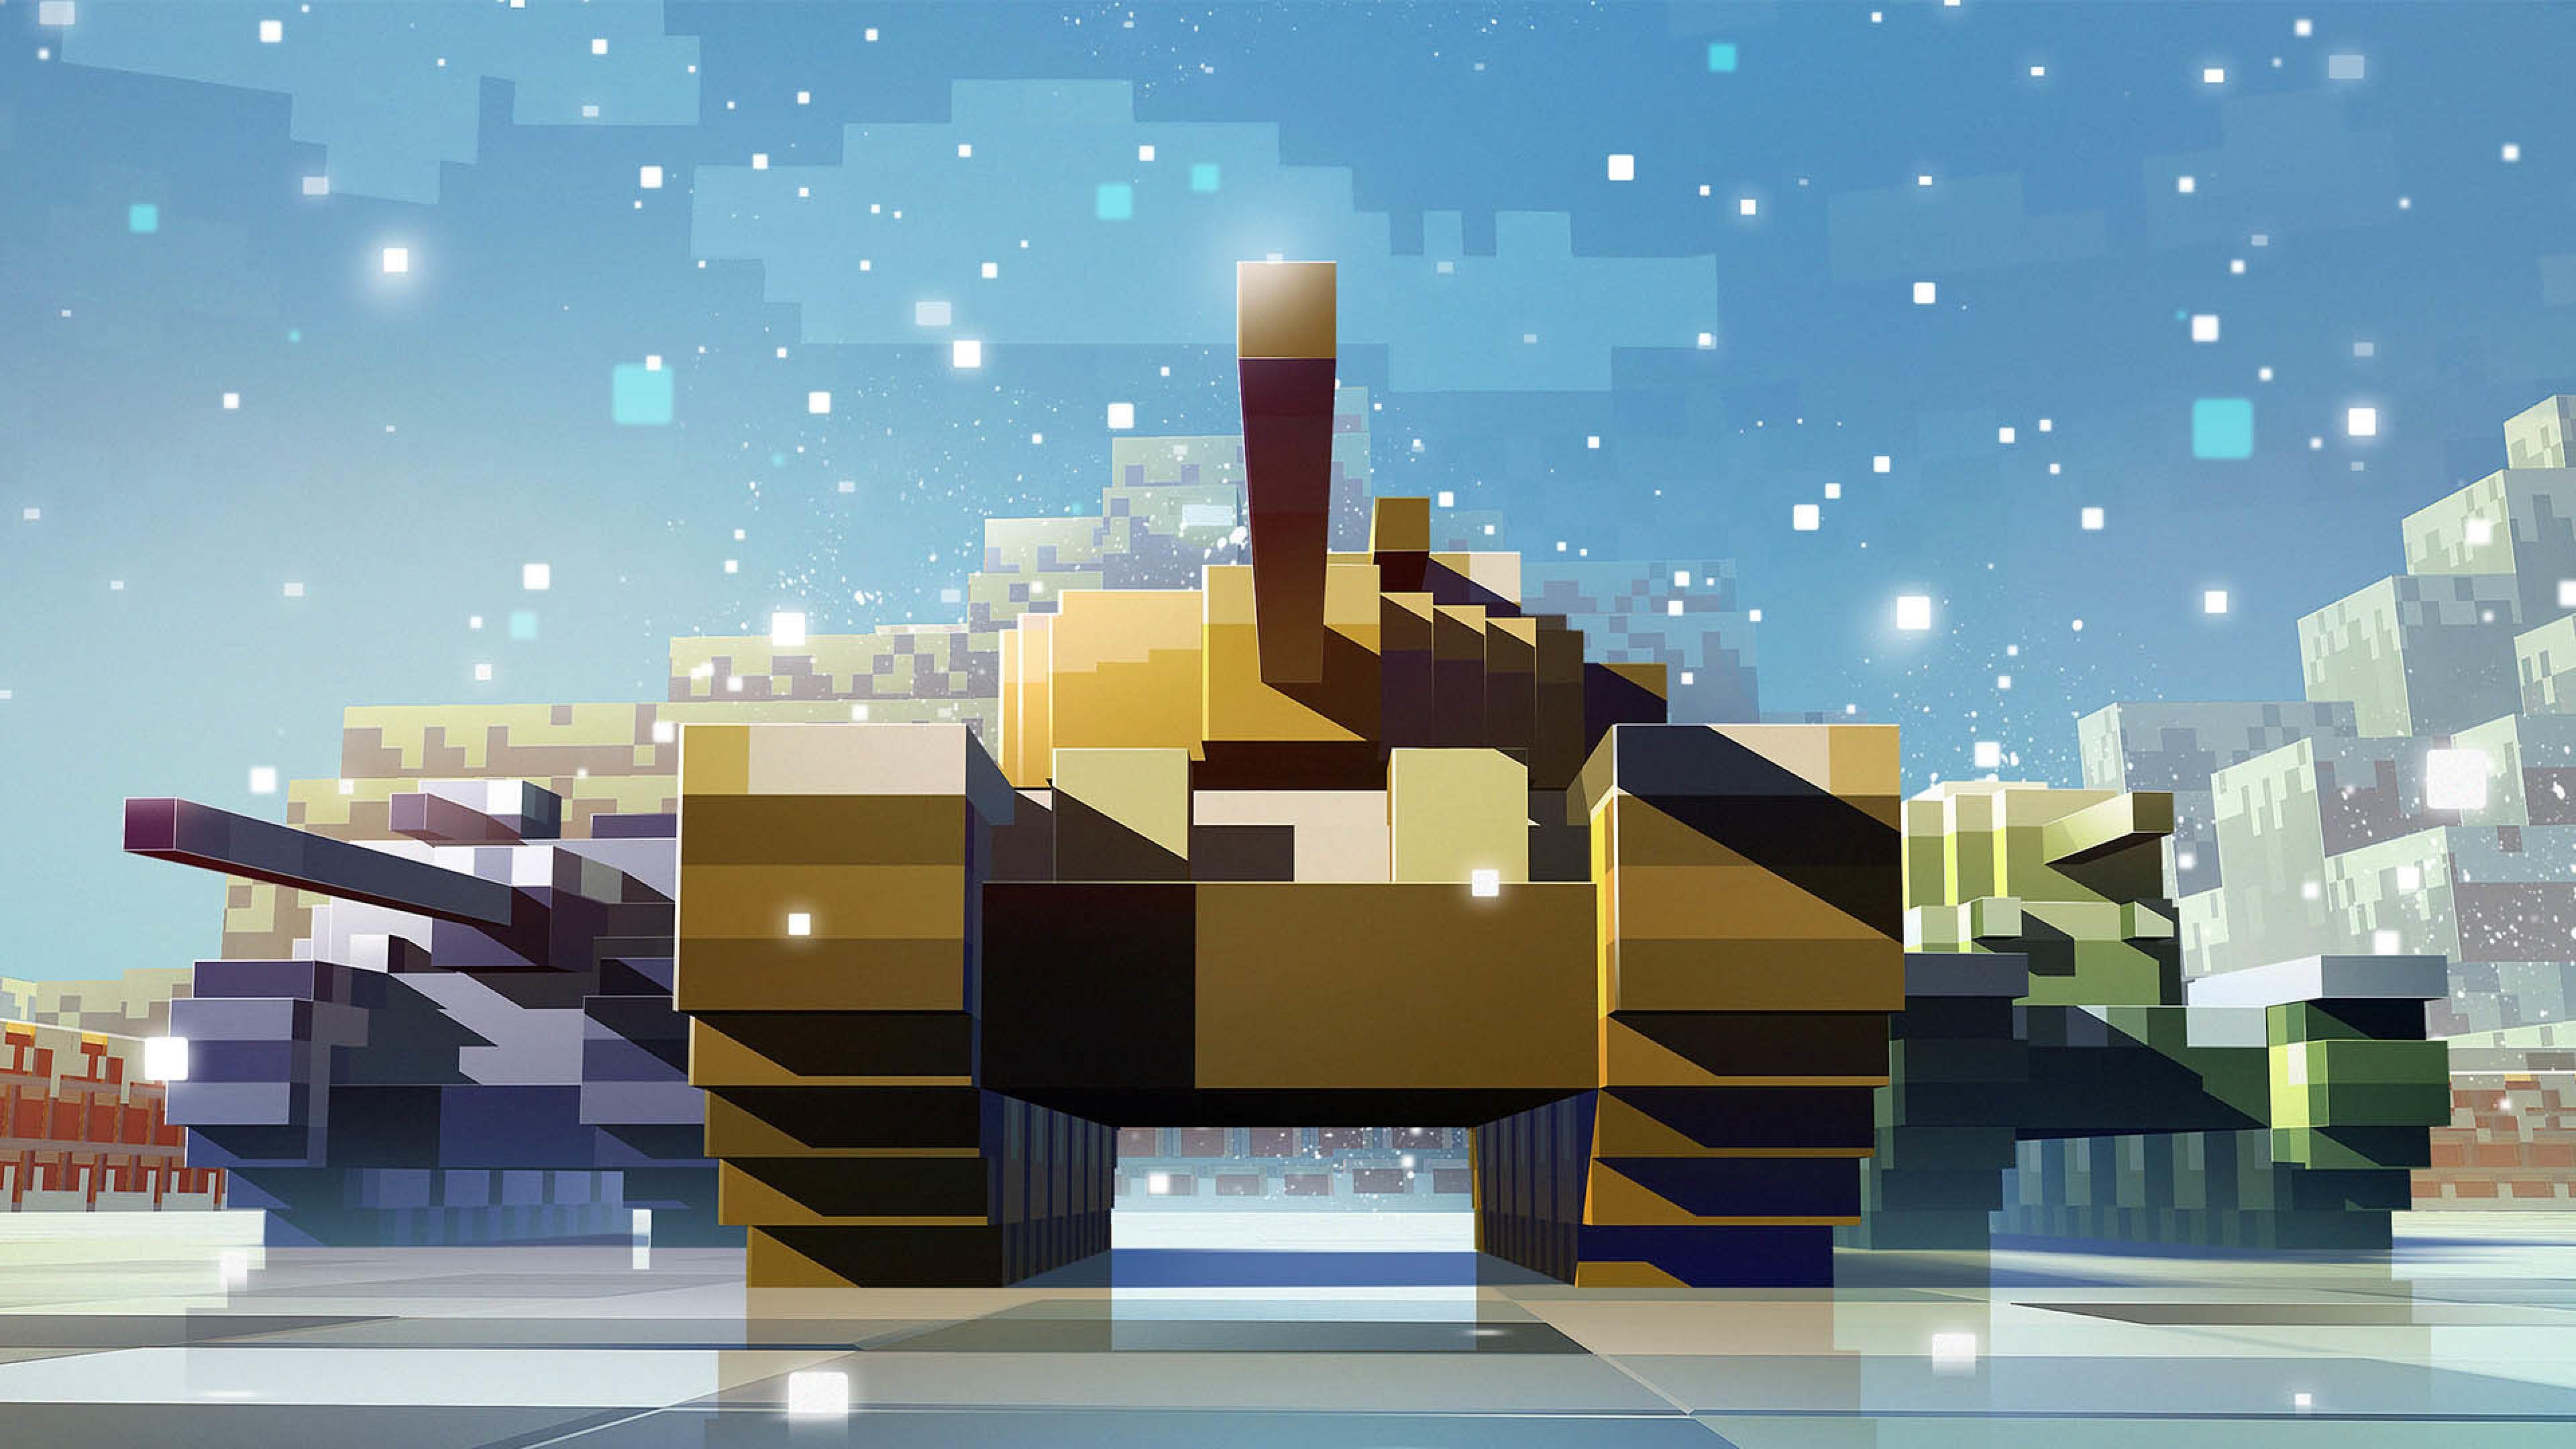 world of tanks pixels 1535966500 - World Of Tanks Pixels - xbox games wallpapers, world of tanks wallpapers, ps4 wallpapers, games wallpapers